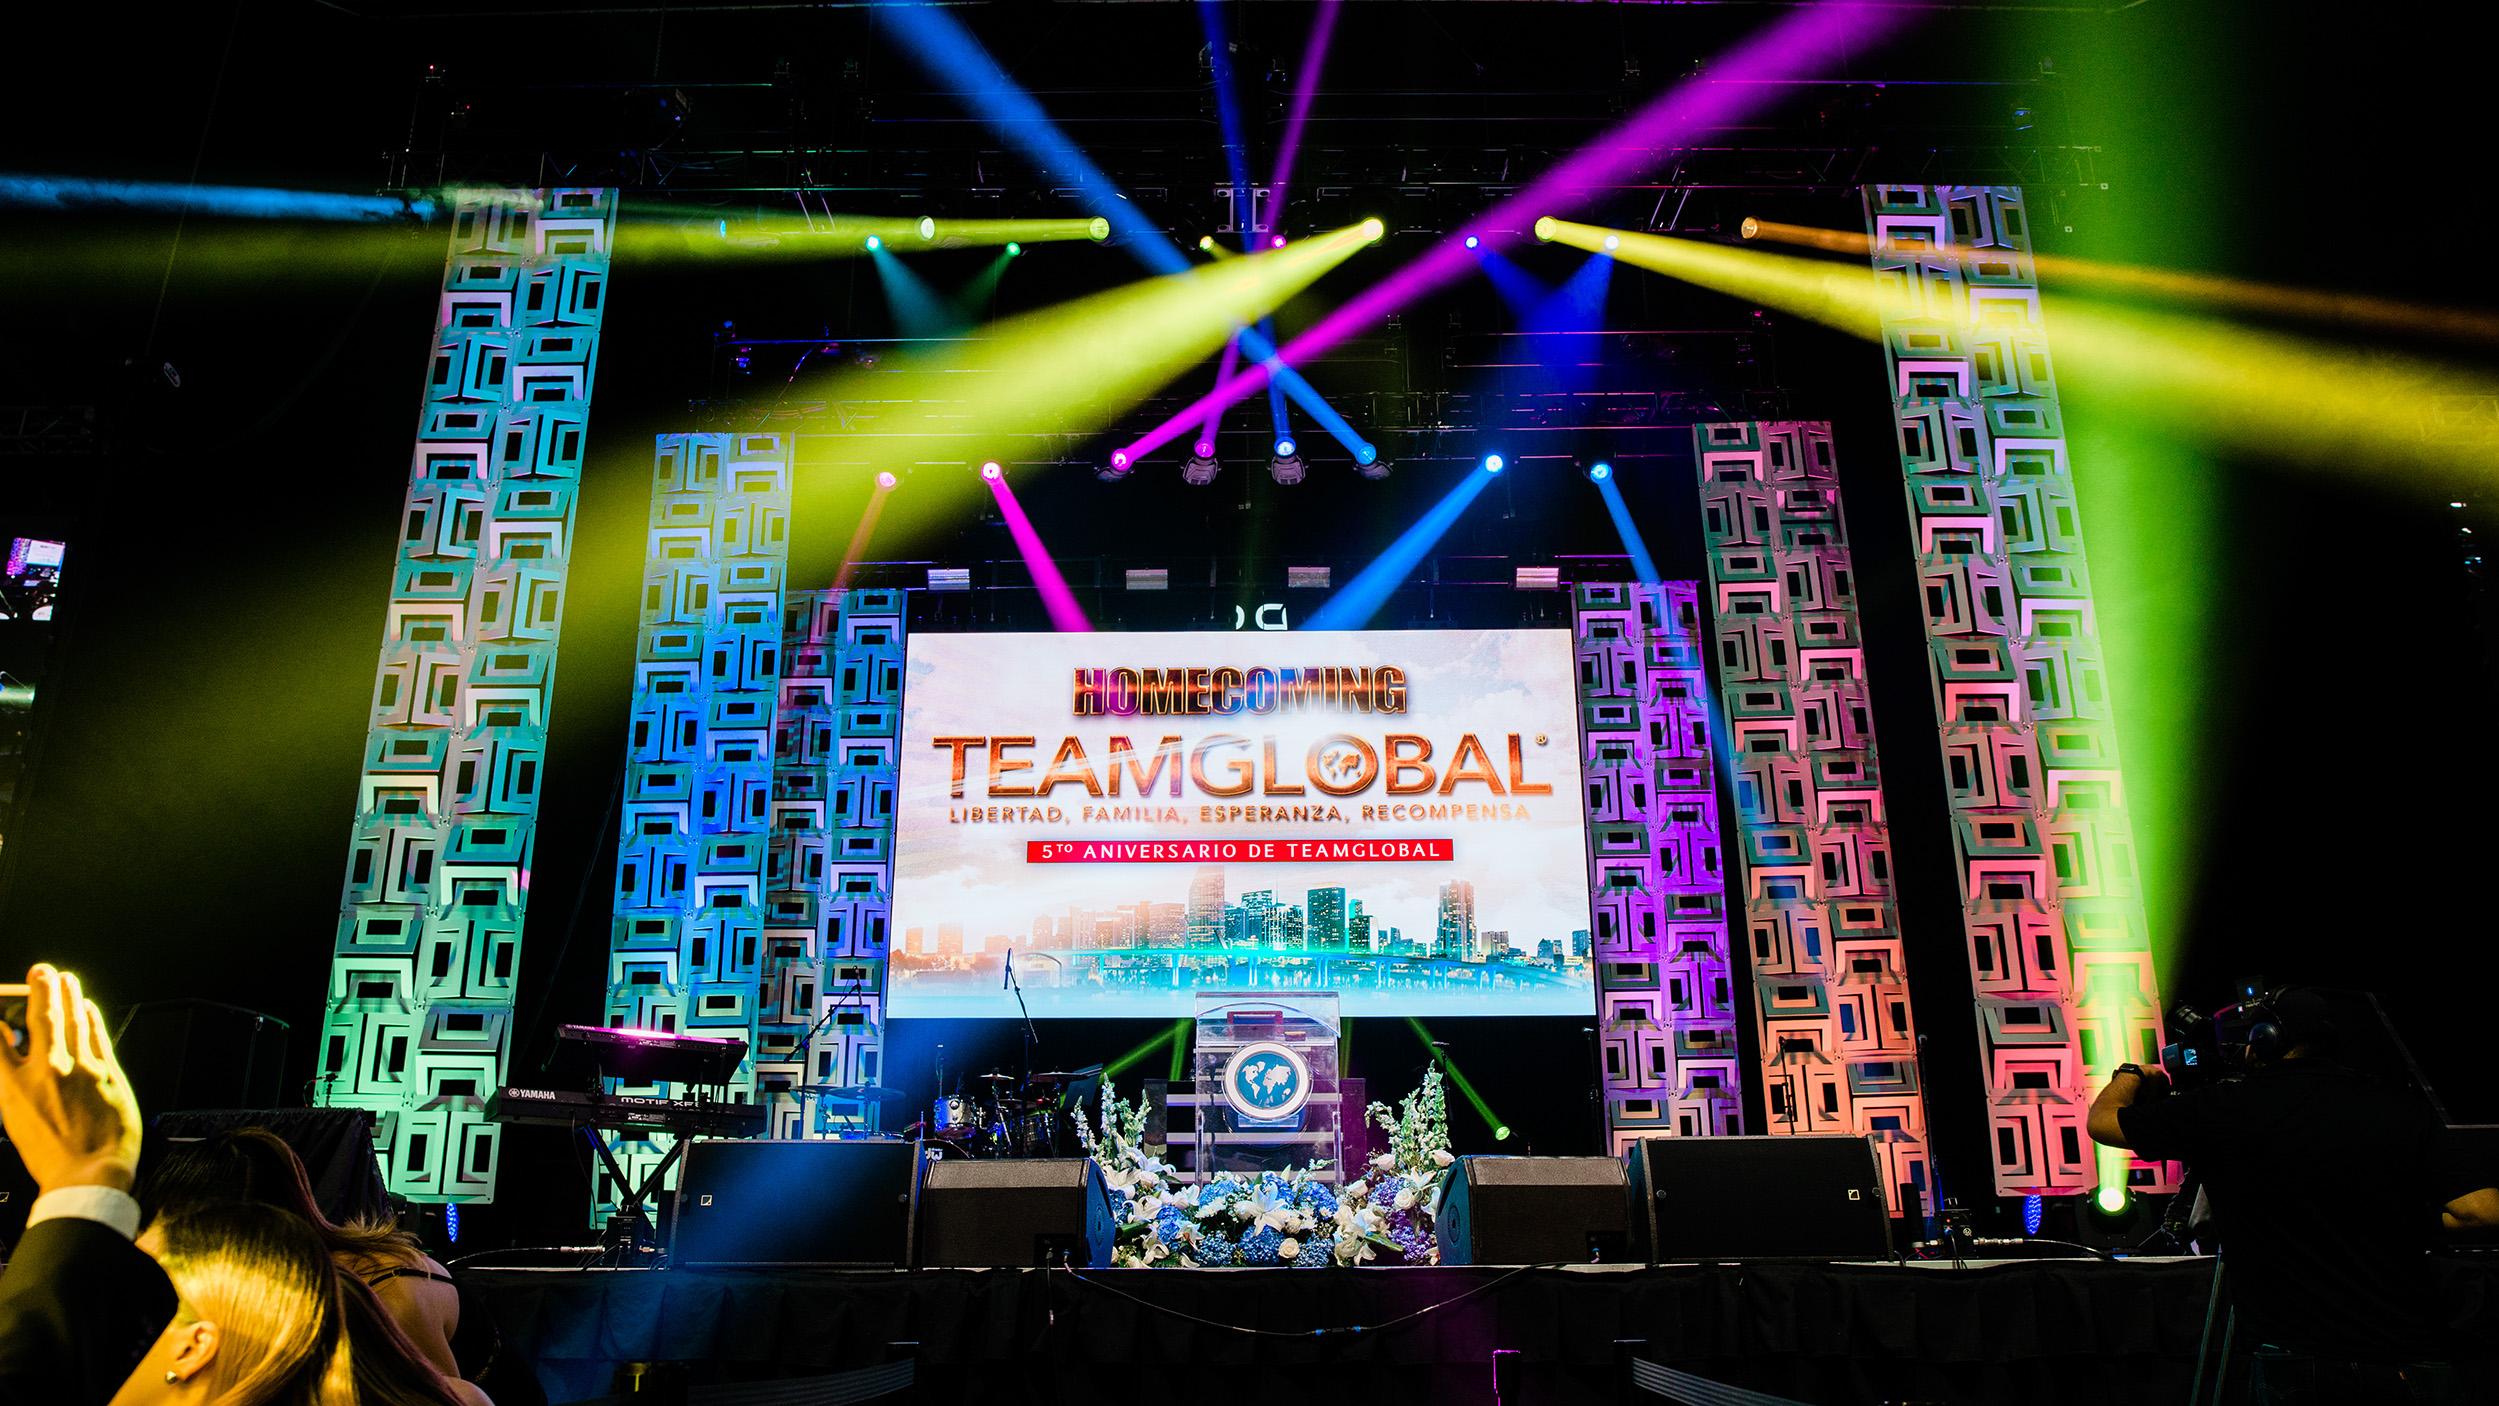 Amway TeamGlobal 5th Anniversary -